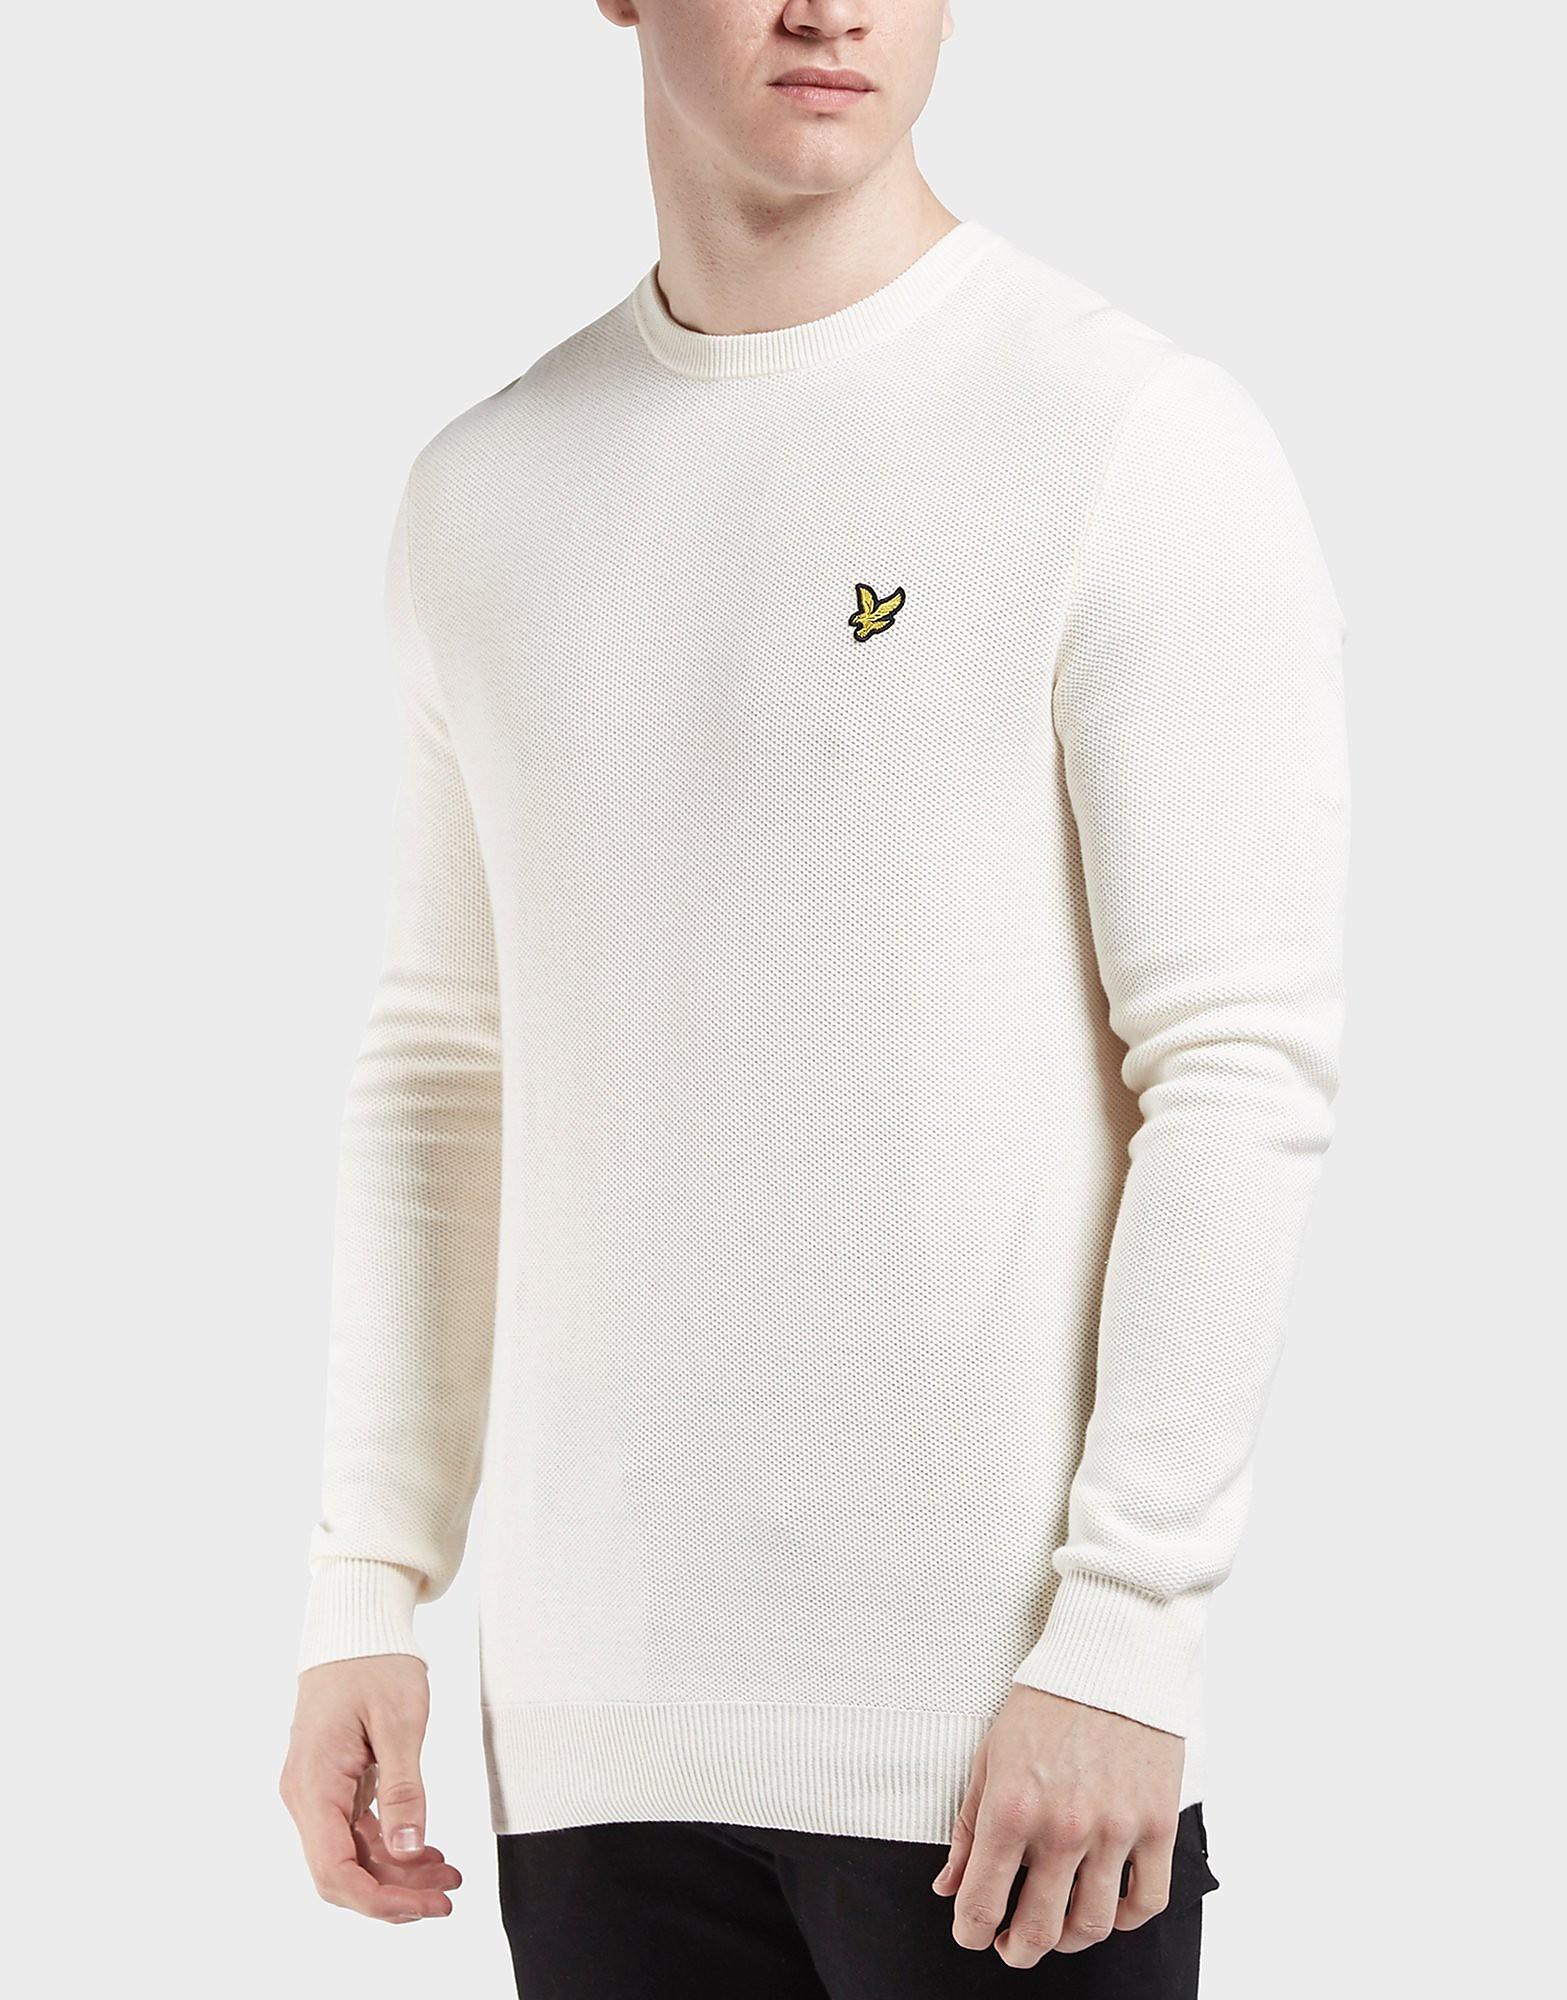 Lyle & Scott Honeycomb Crew Sweatshirt